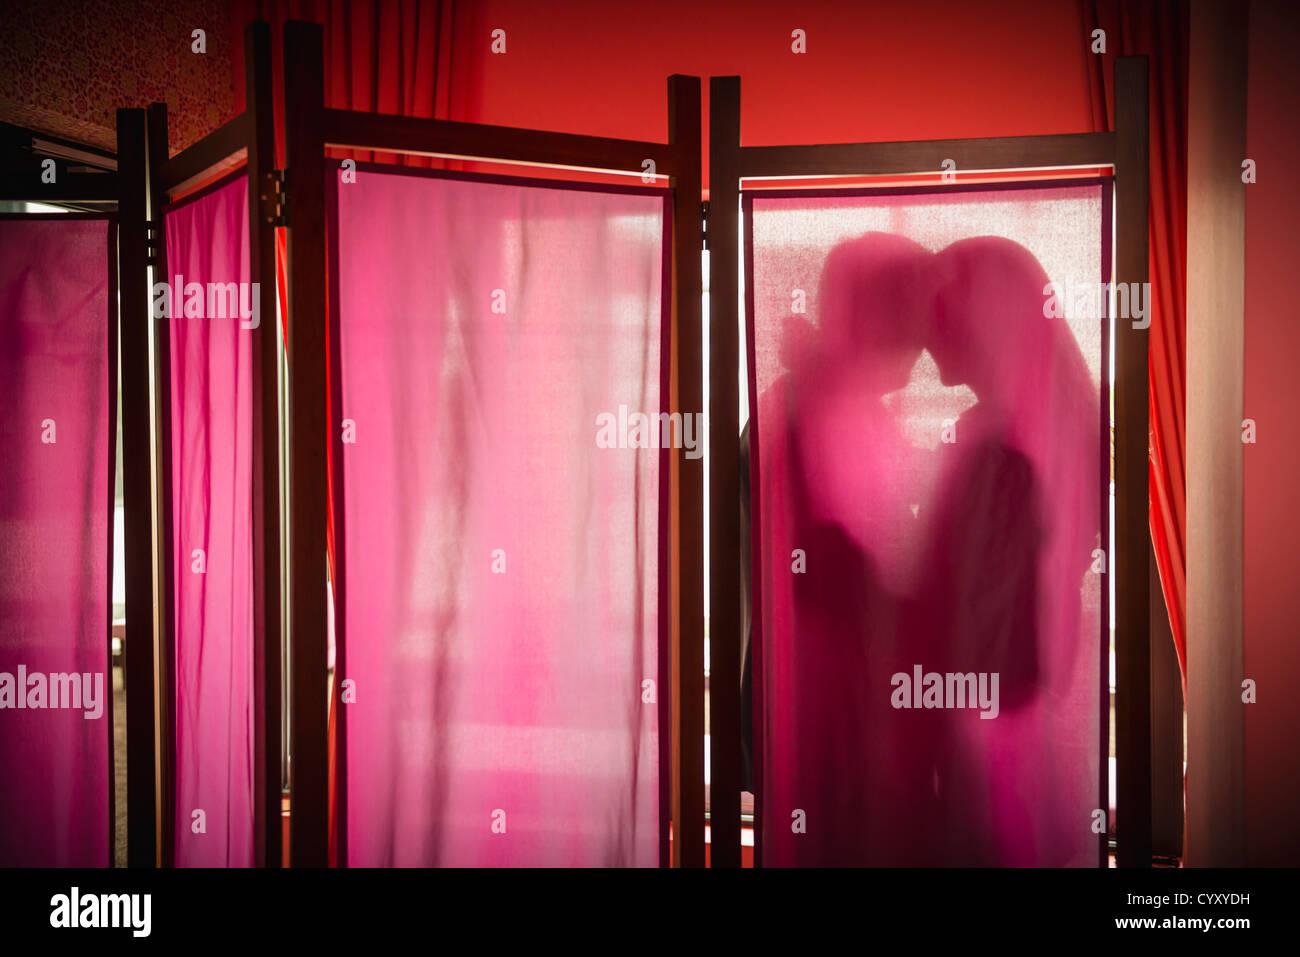 Alemania, Stuttgart, negocio par en romance Foto de stock